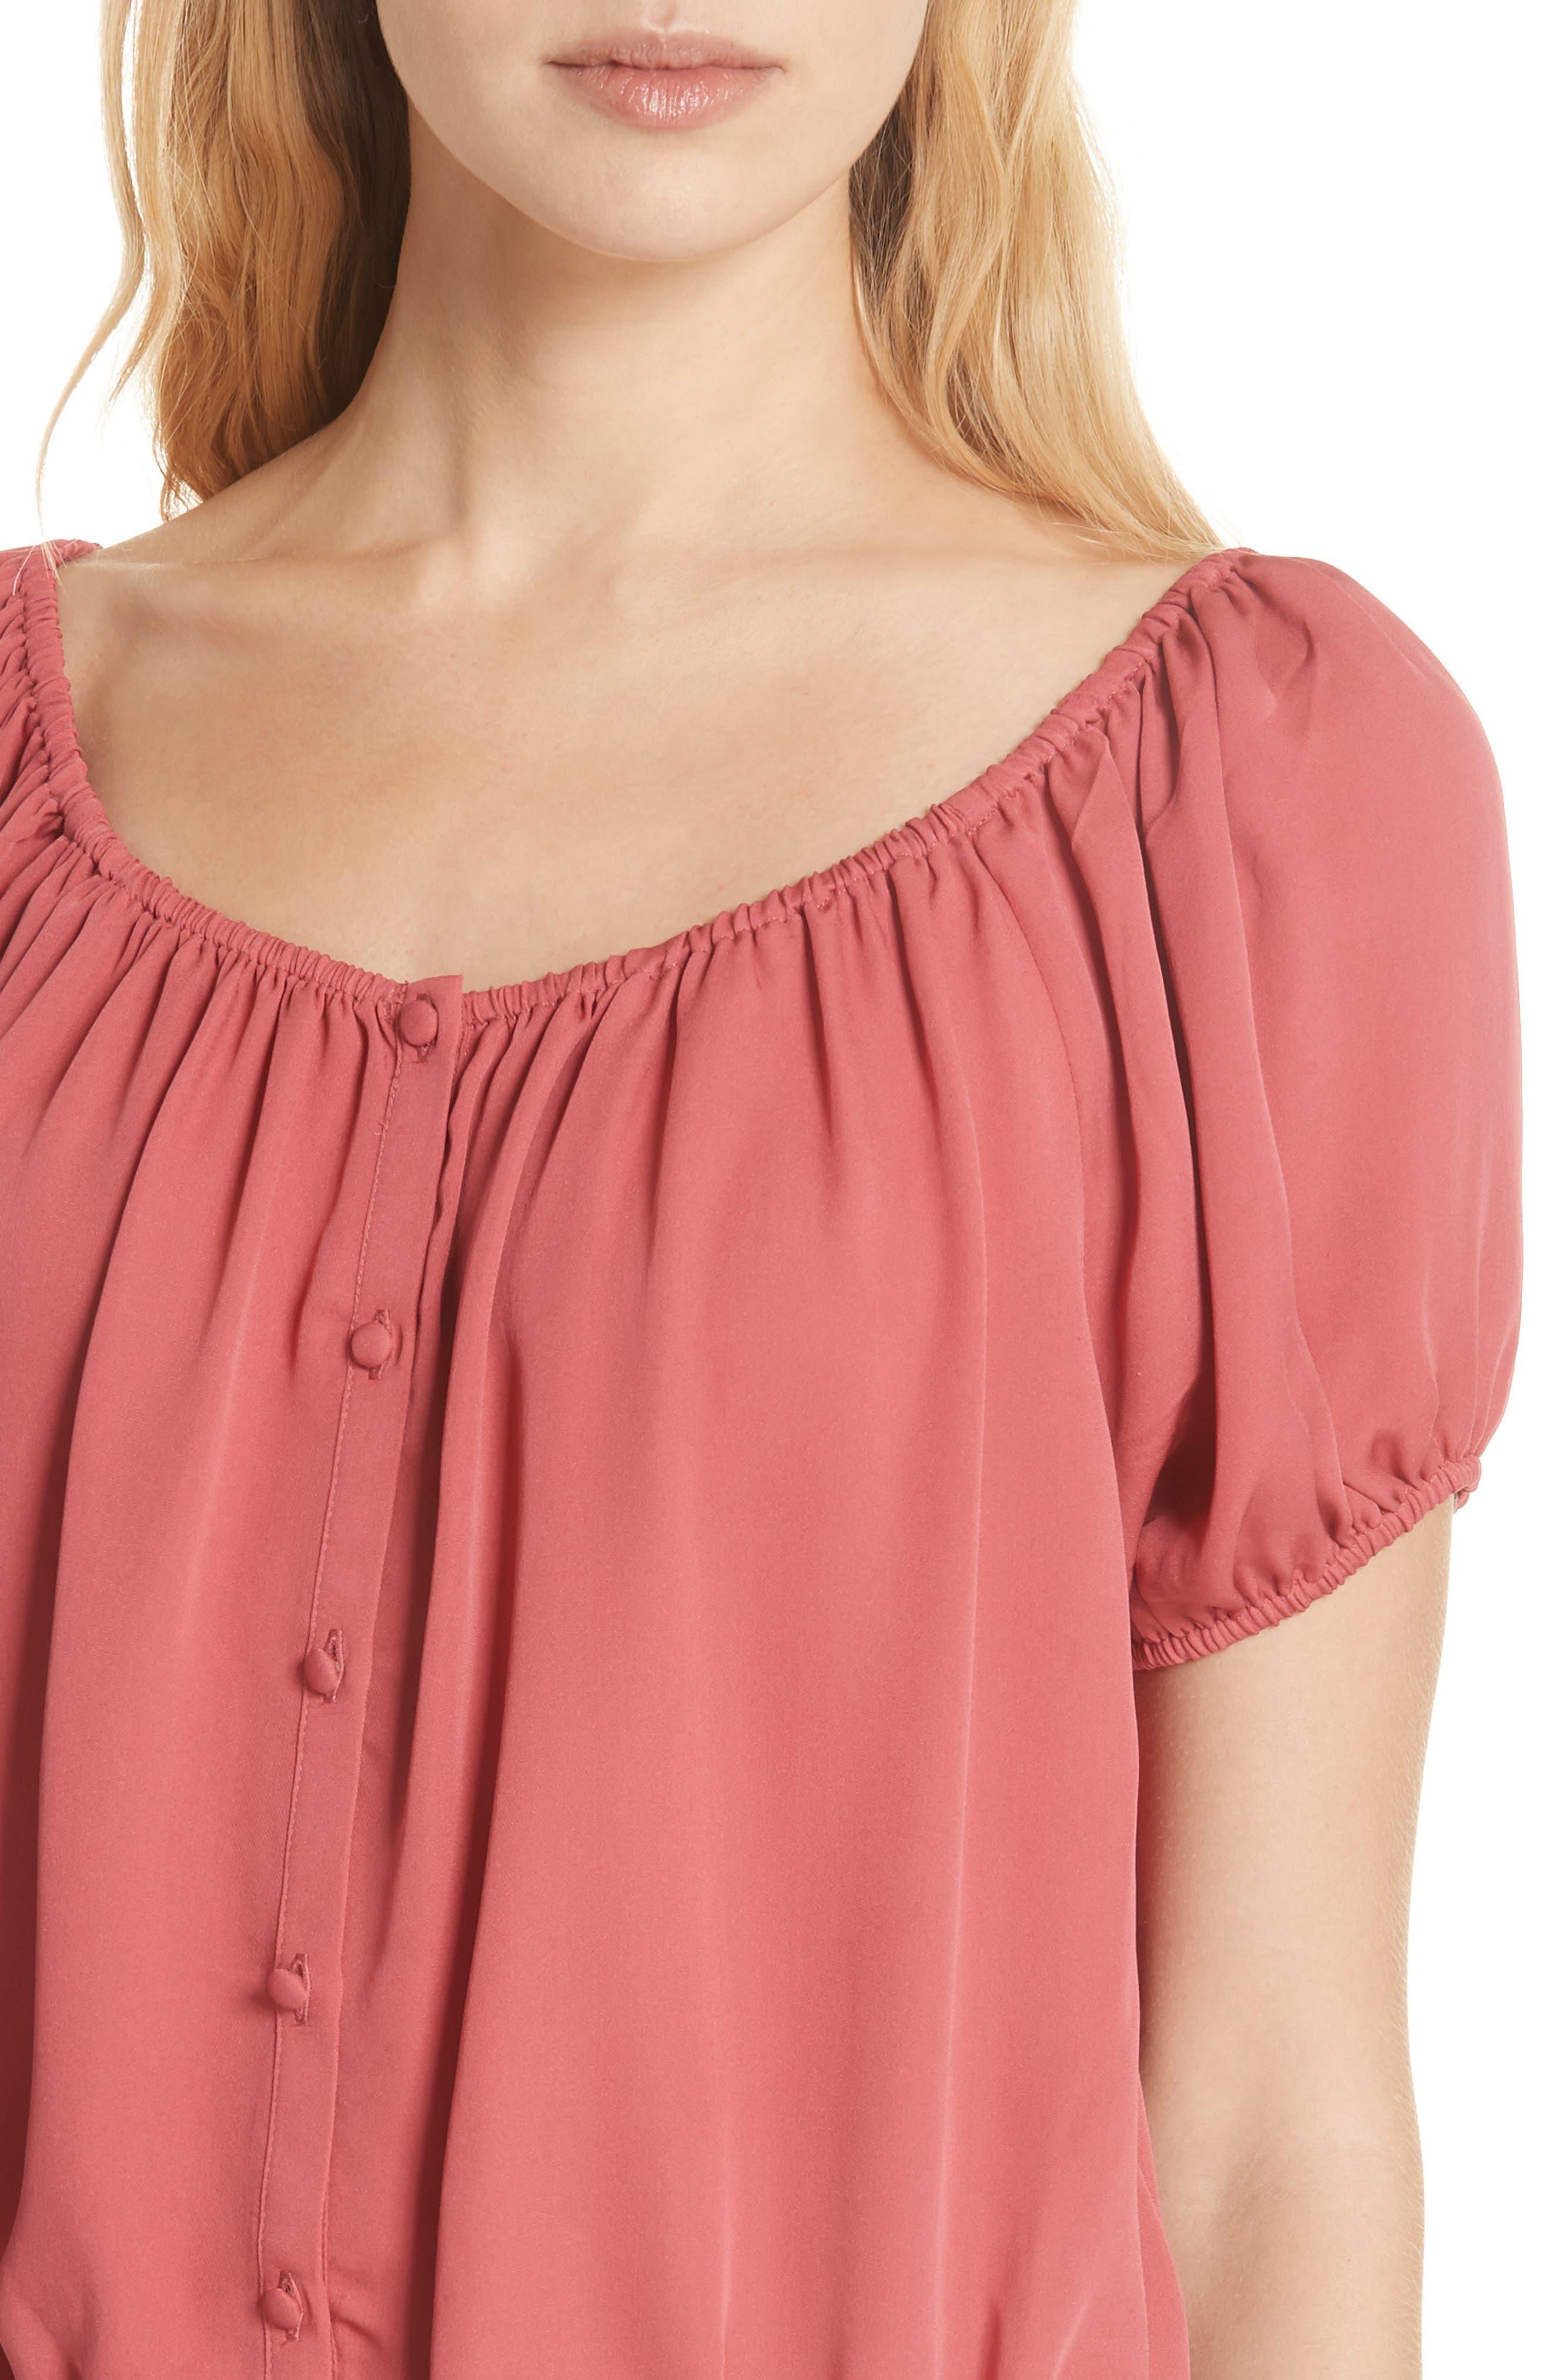 Blesina Tie Front Short Sleeve Silk Blouse,                             Alternate thumbnail 4, color,                             651